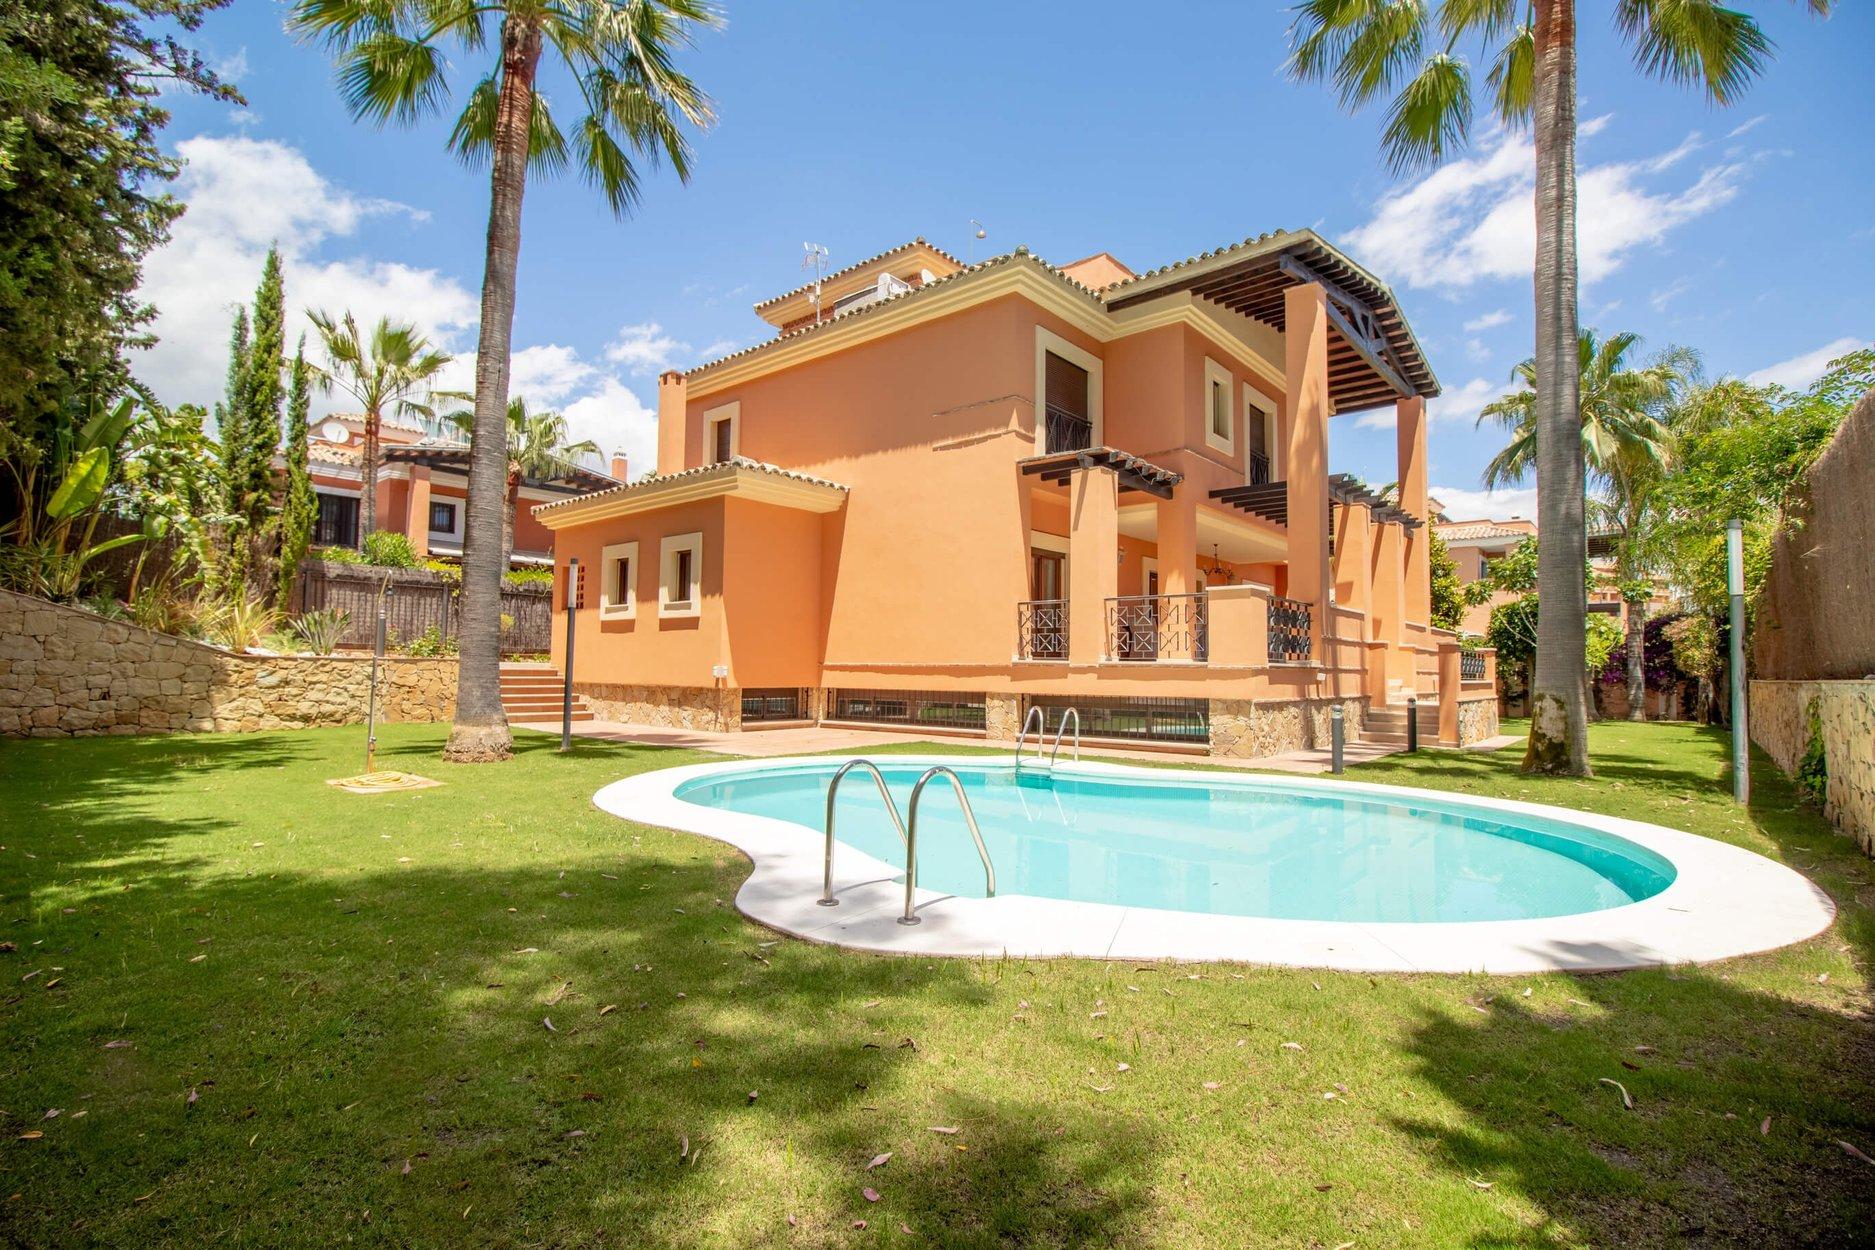 aaa6 Комнатный Дом в Los Monteros, Marbella | M140625